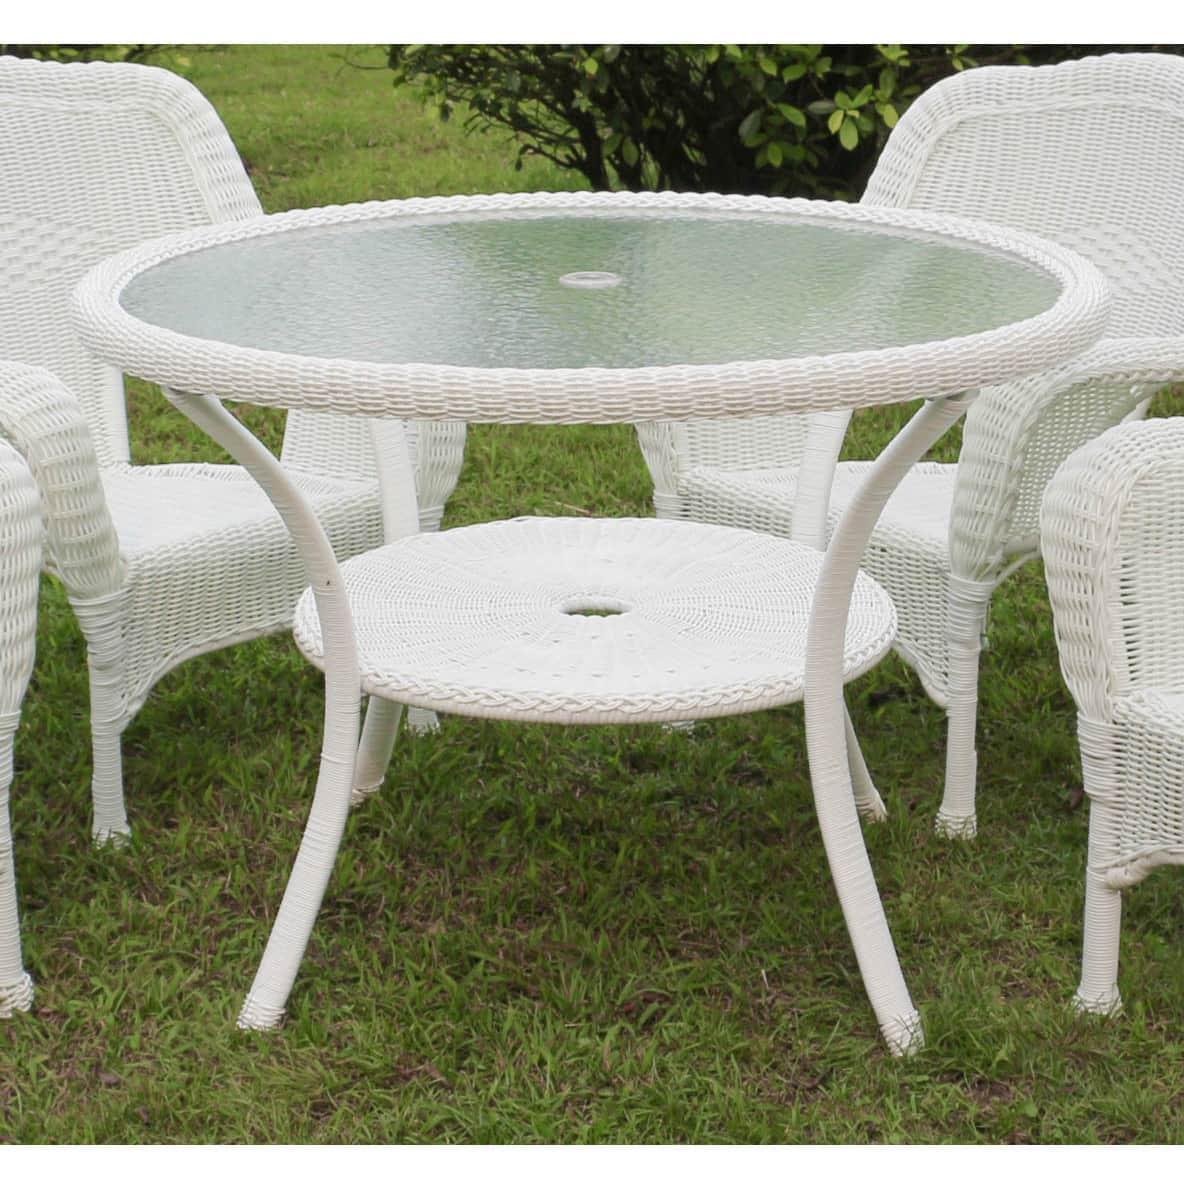 Online Patio Furniture Deals: Buy Outdoor Dining Tables Online At Overstock